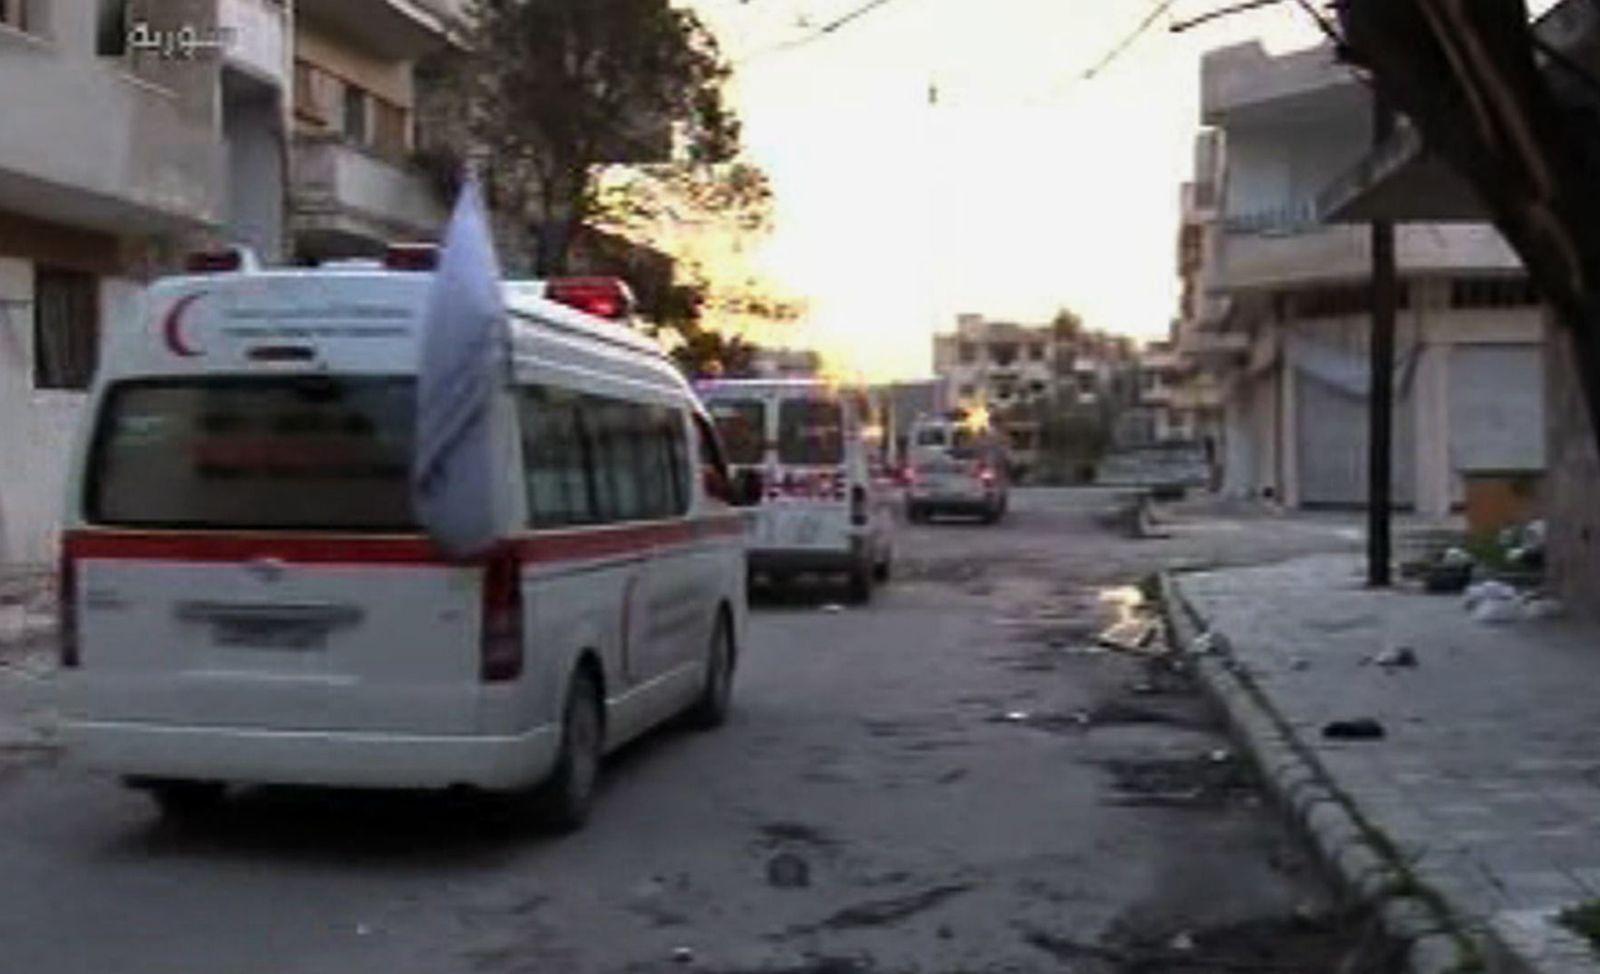 Syrien / Homs / Roter Halbmond